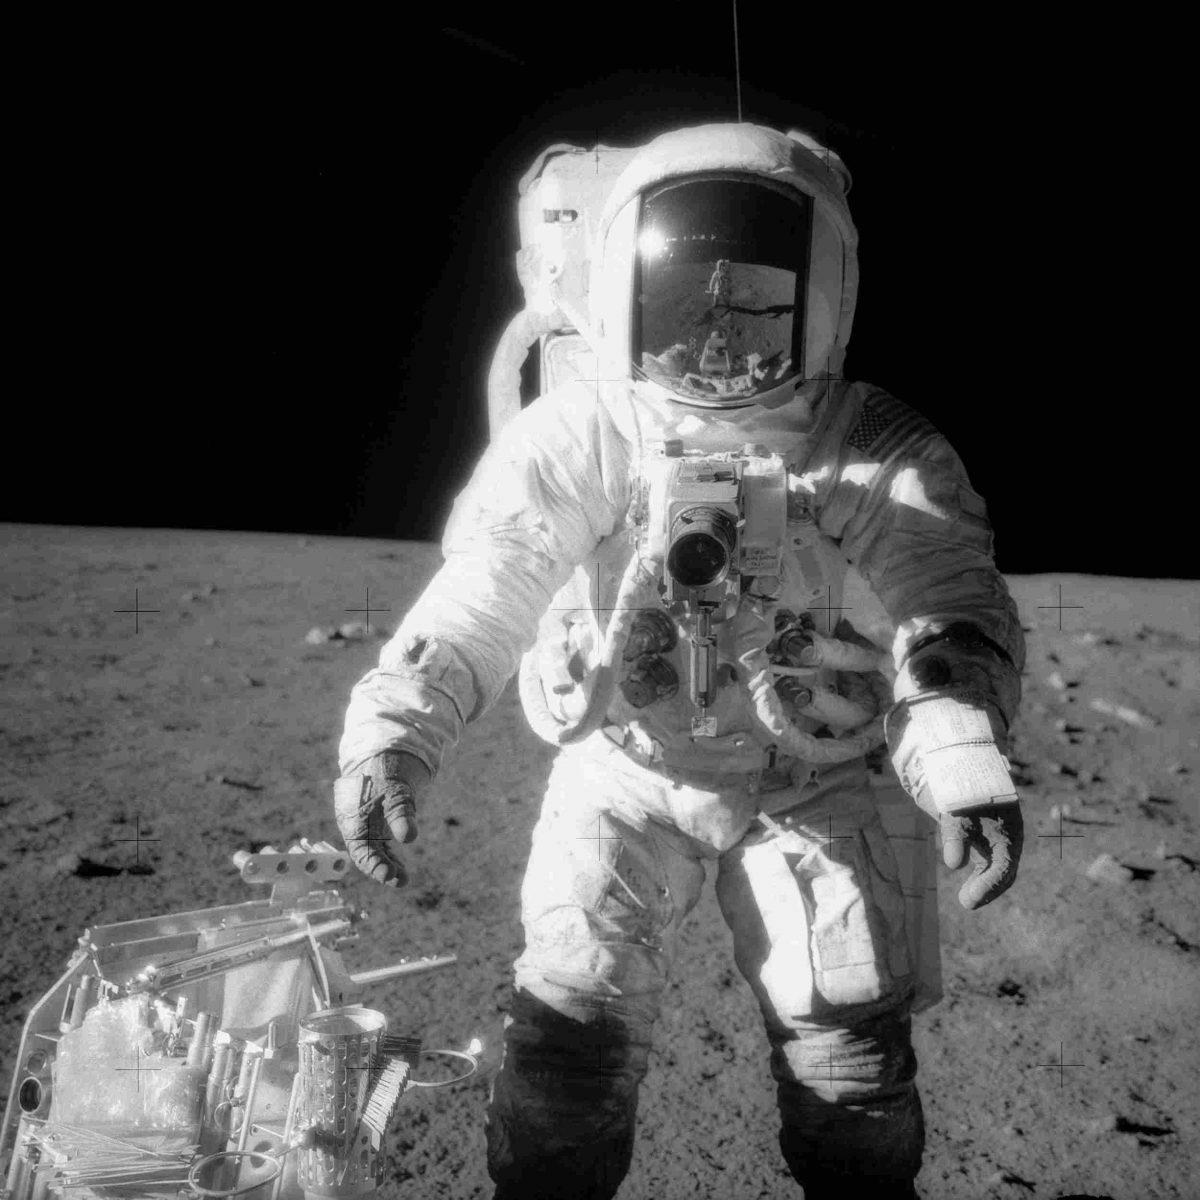 moon_06-1200x1200.jpg